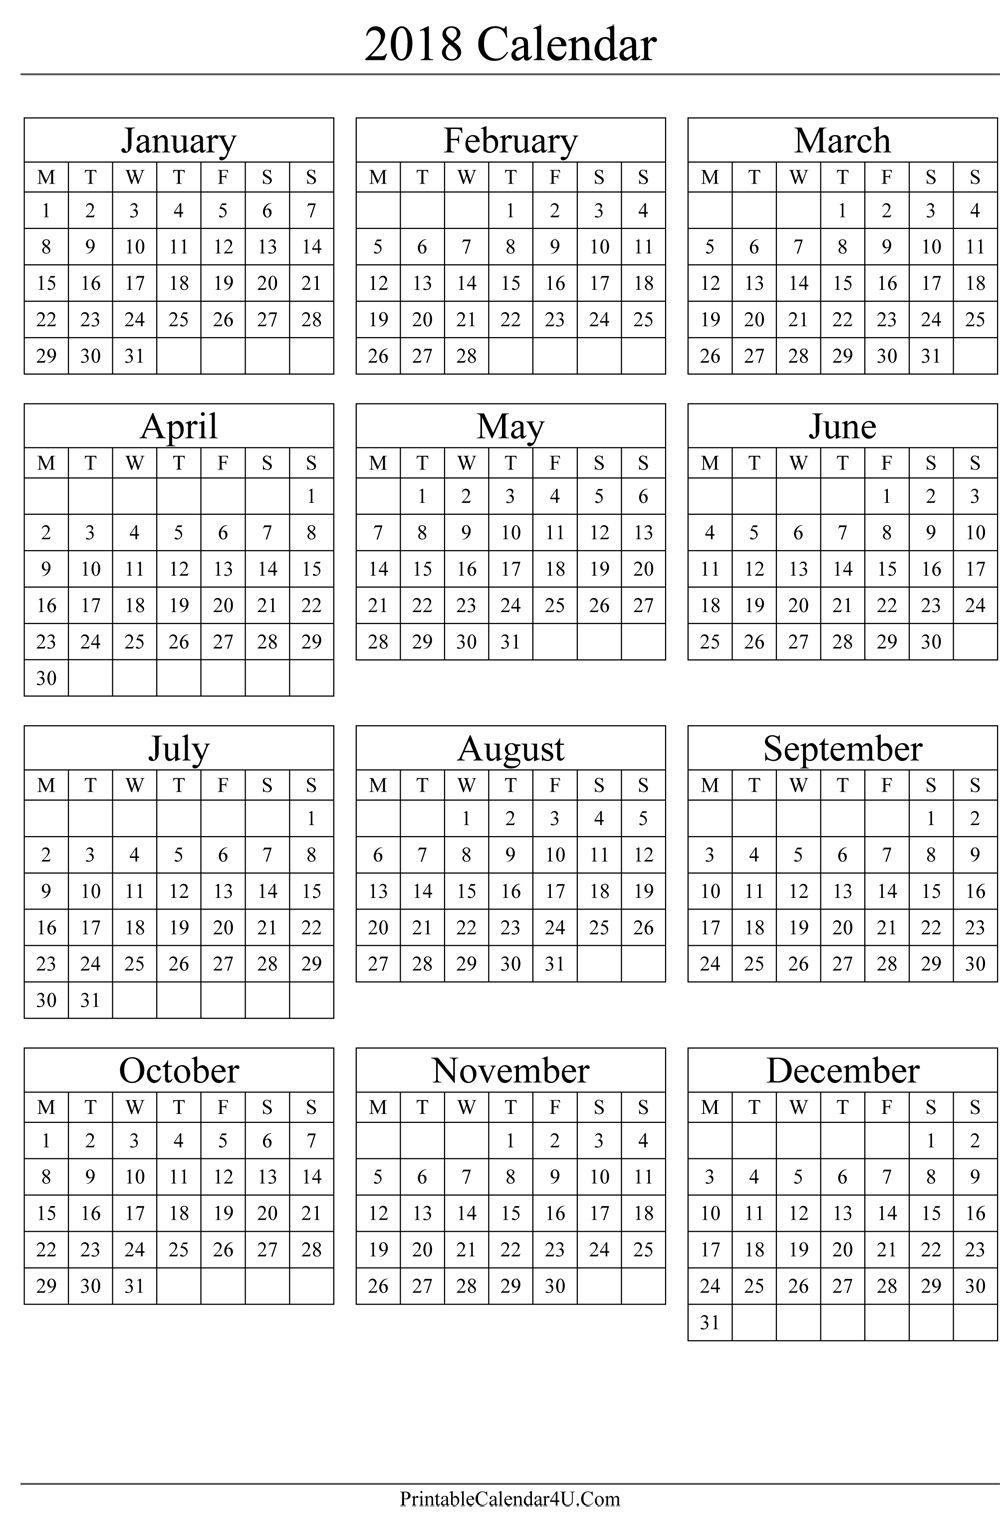 Pincalendar Printable On 2018 Calendar | Calendar 2019